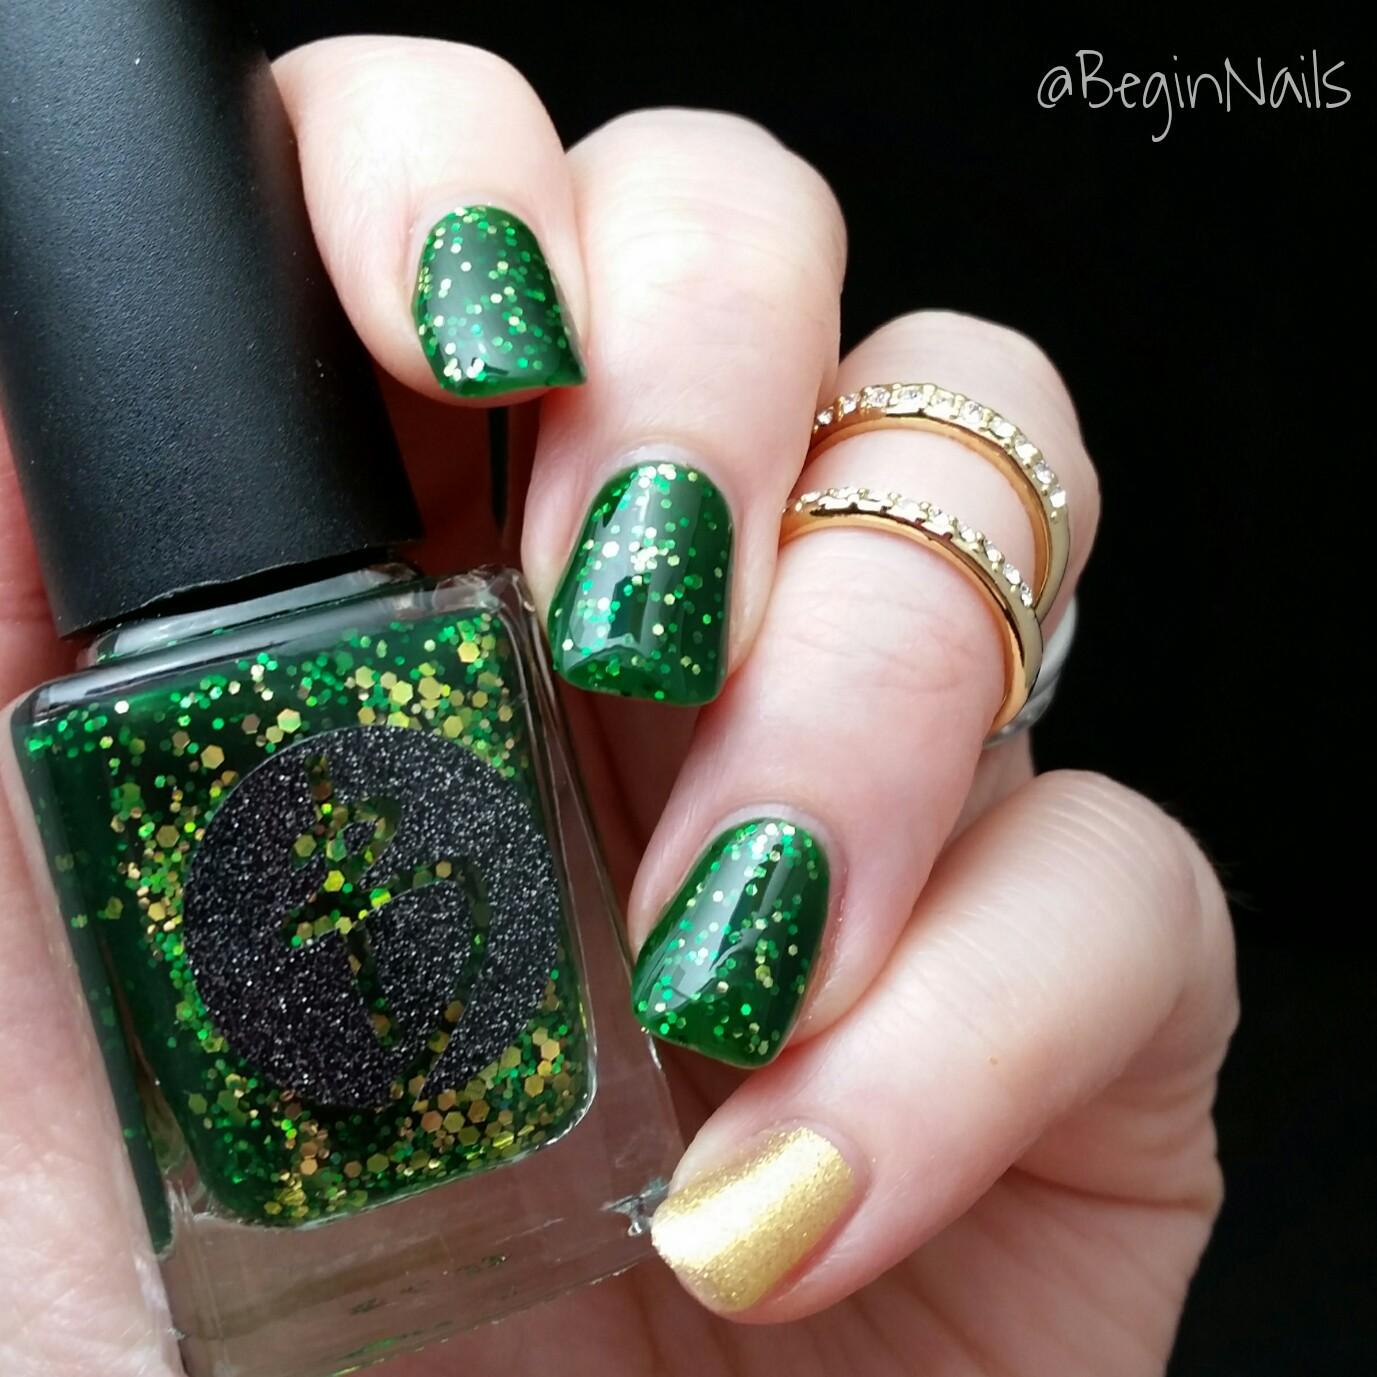 Let\'s Begin Nails: St Patrick\'s Day Nails Using Bliss Polish and ...